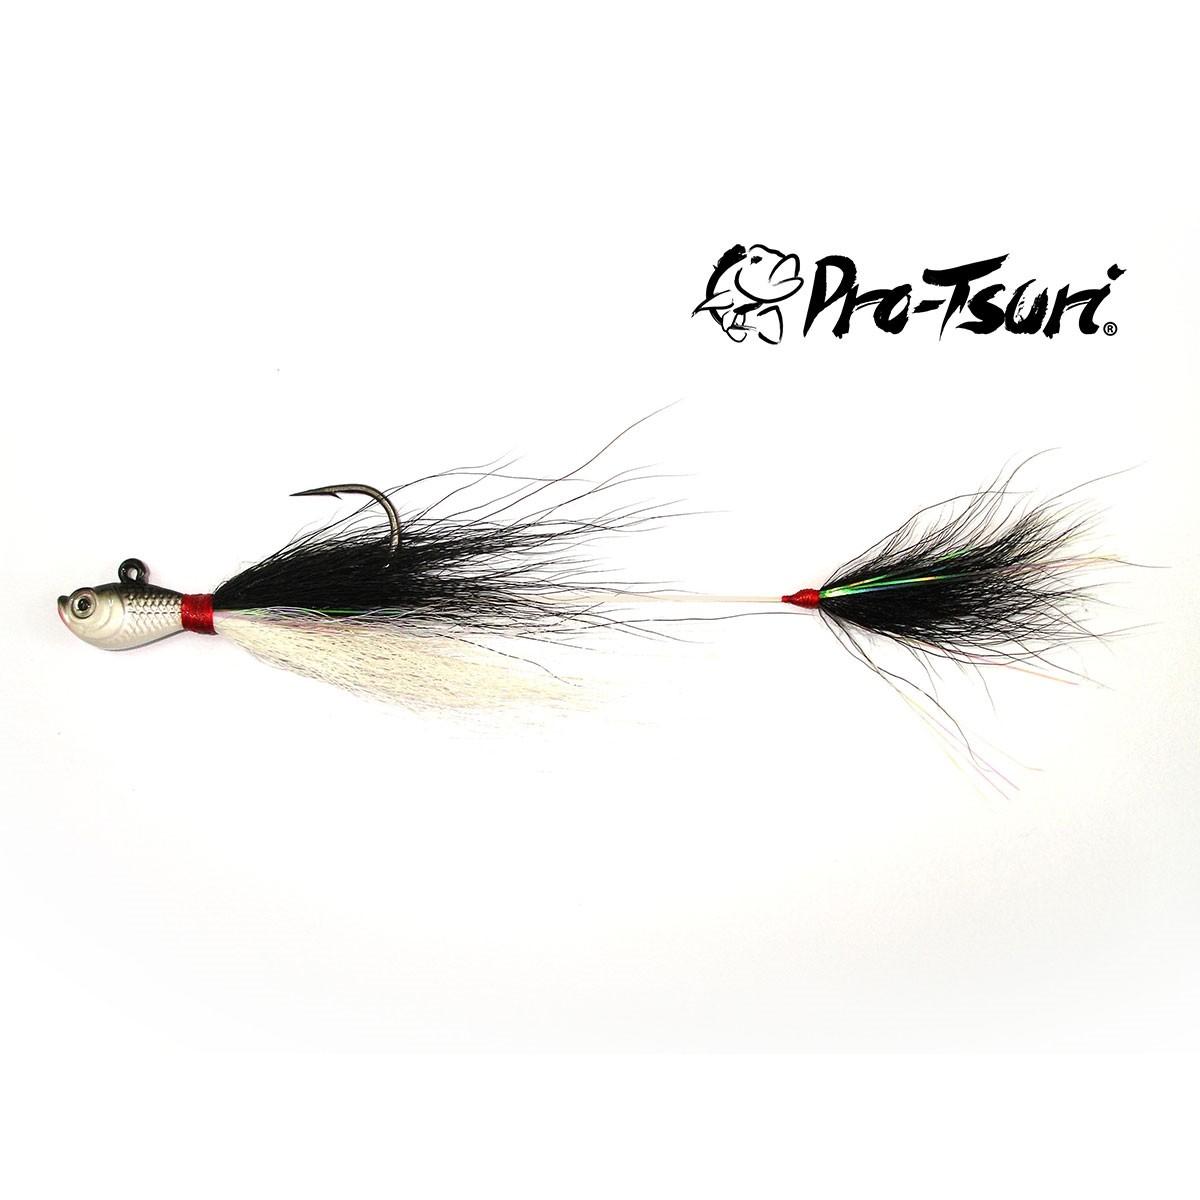 Jig Pro-Tsuri Cichla 4/0 15grs  - Comprando & Pescando